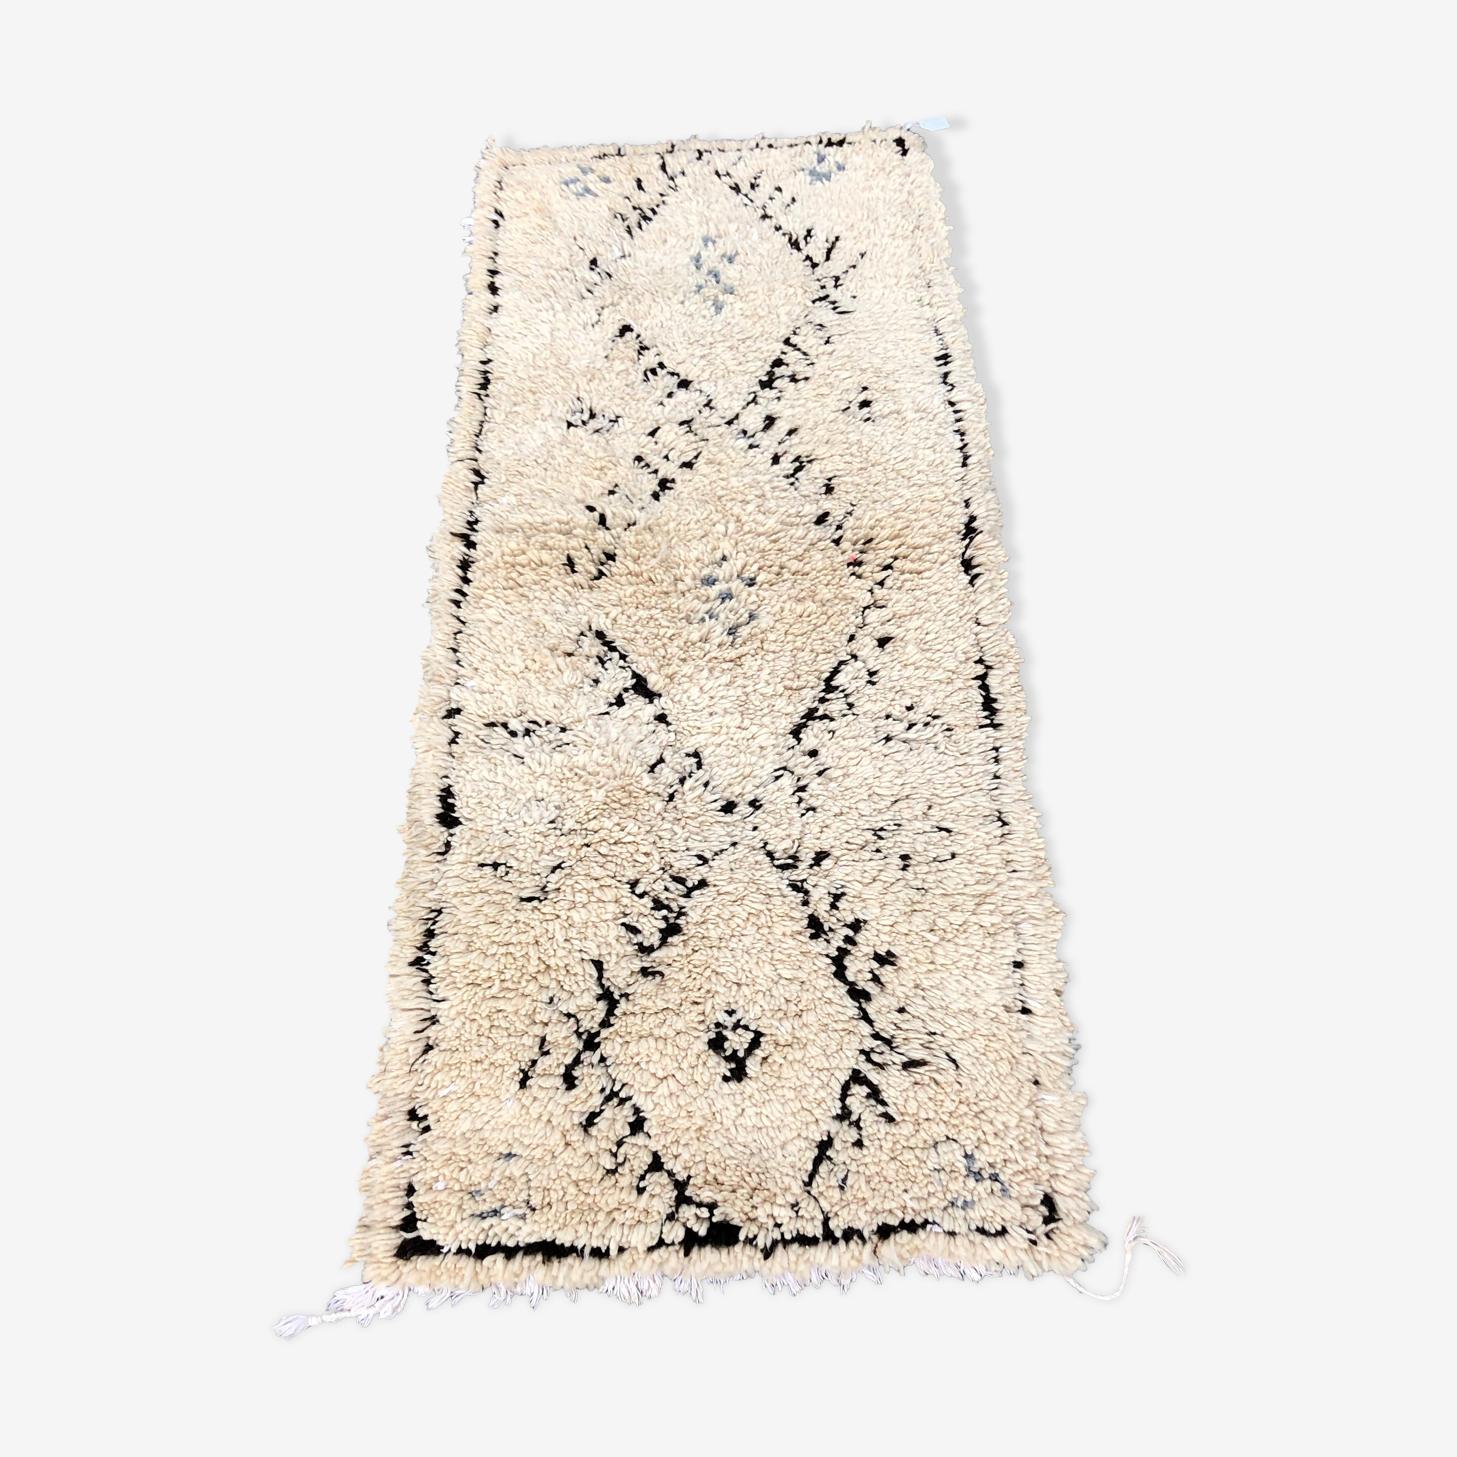 Berber beni ouarain rug 185 x 75 cm